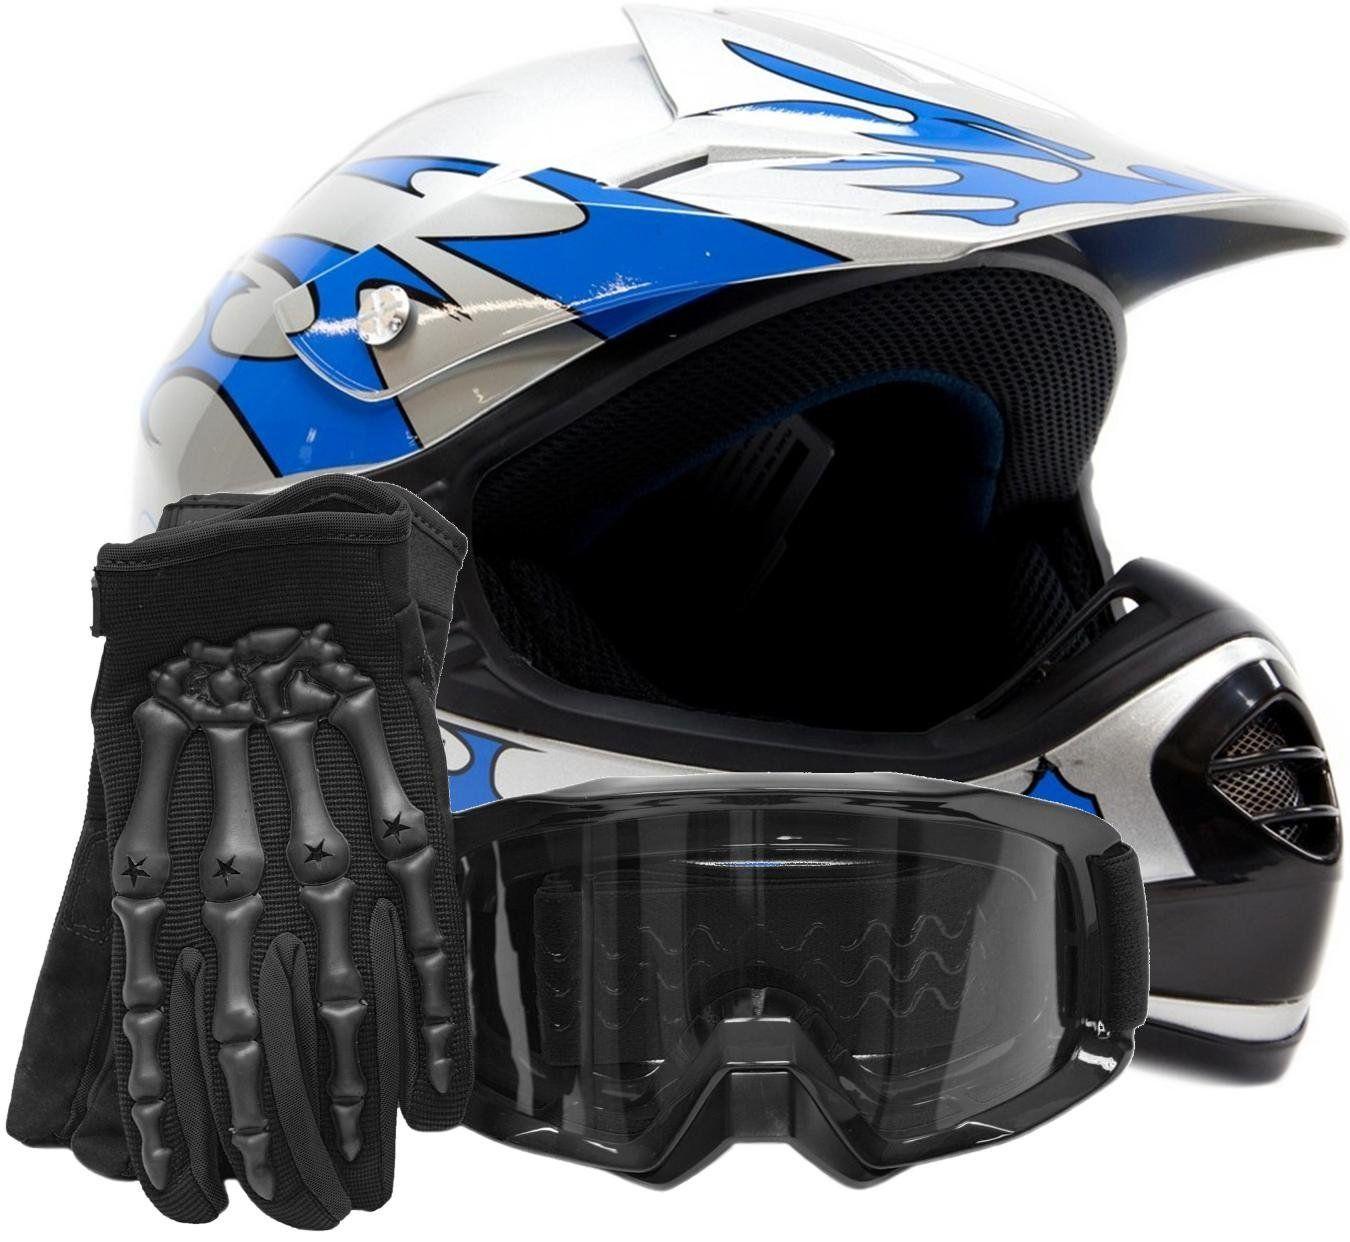 Youth Kids Offroad Gear Combo Helmet Gloves Goggles Dot Motocross Atv Dirt Bike Motorcycle Blue Black Large Helmet Offroad Motocross